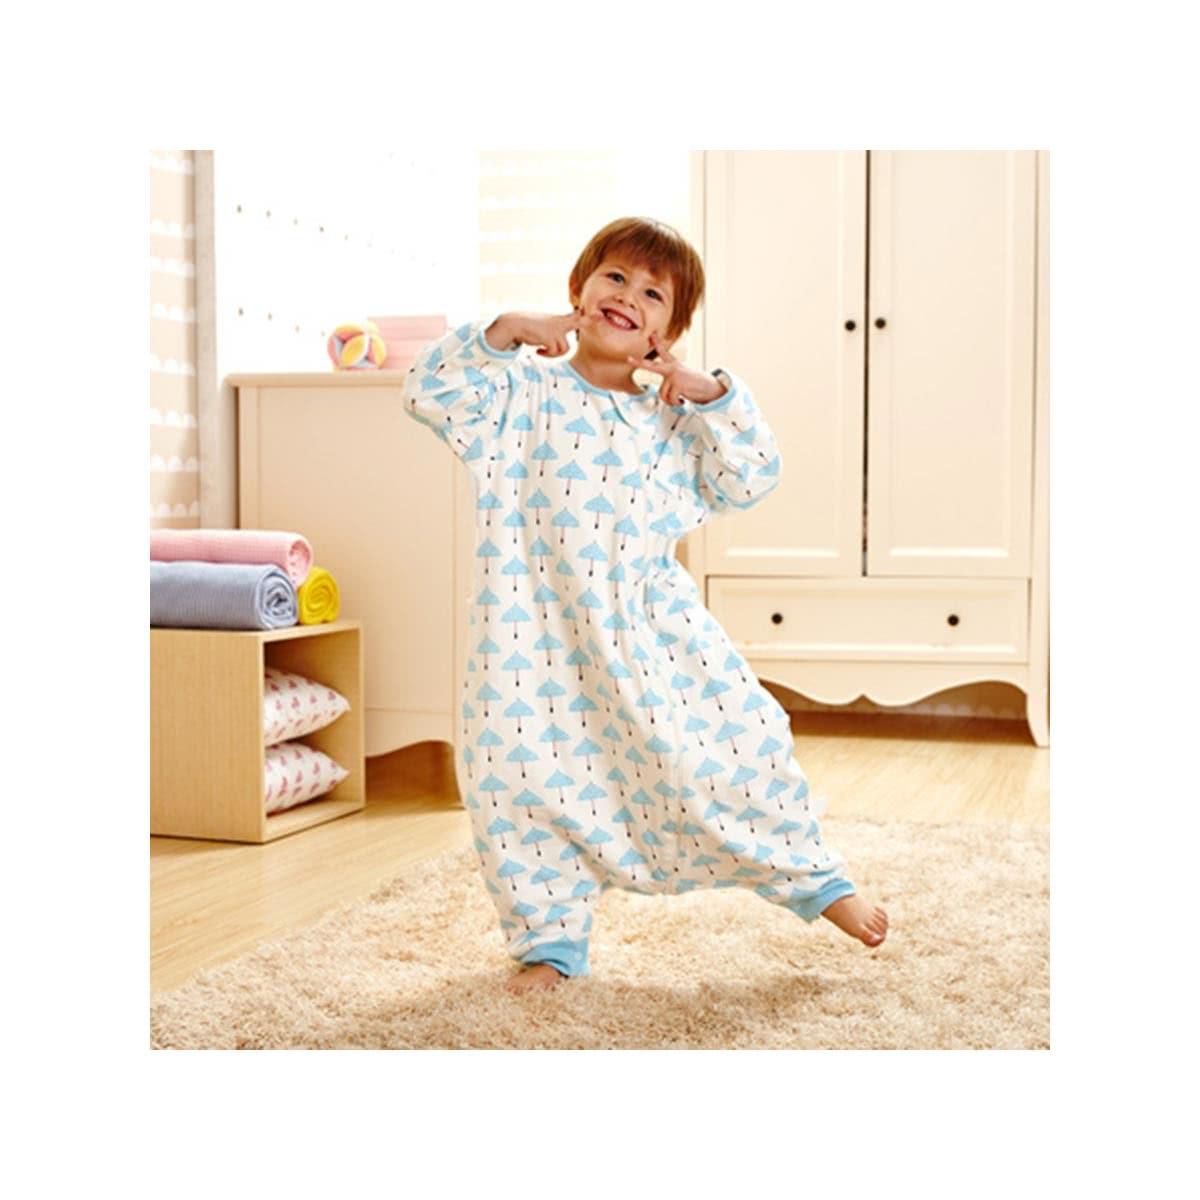 GoodBaby好孩子 婴幼儿分腿防踢睡袋 春夏款 儿童睡袋婴儿睡衣 70cm 蓝色BQ1561066254000